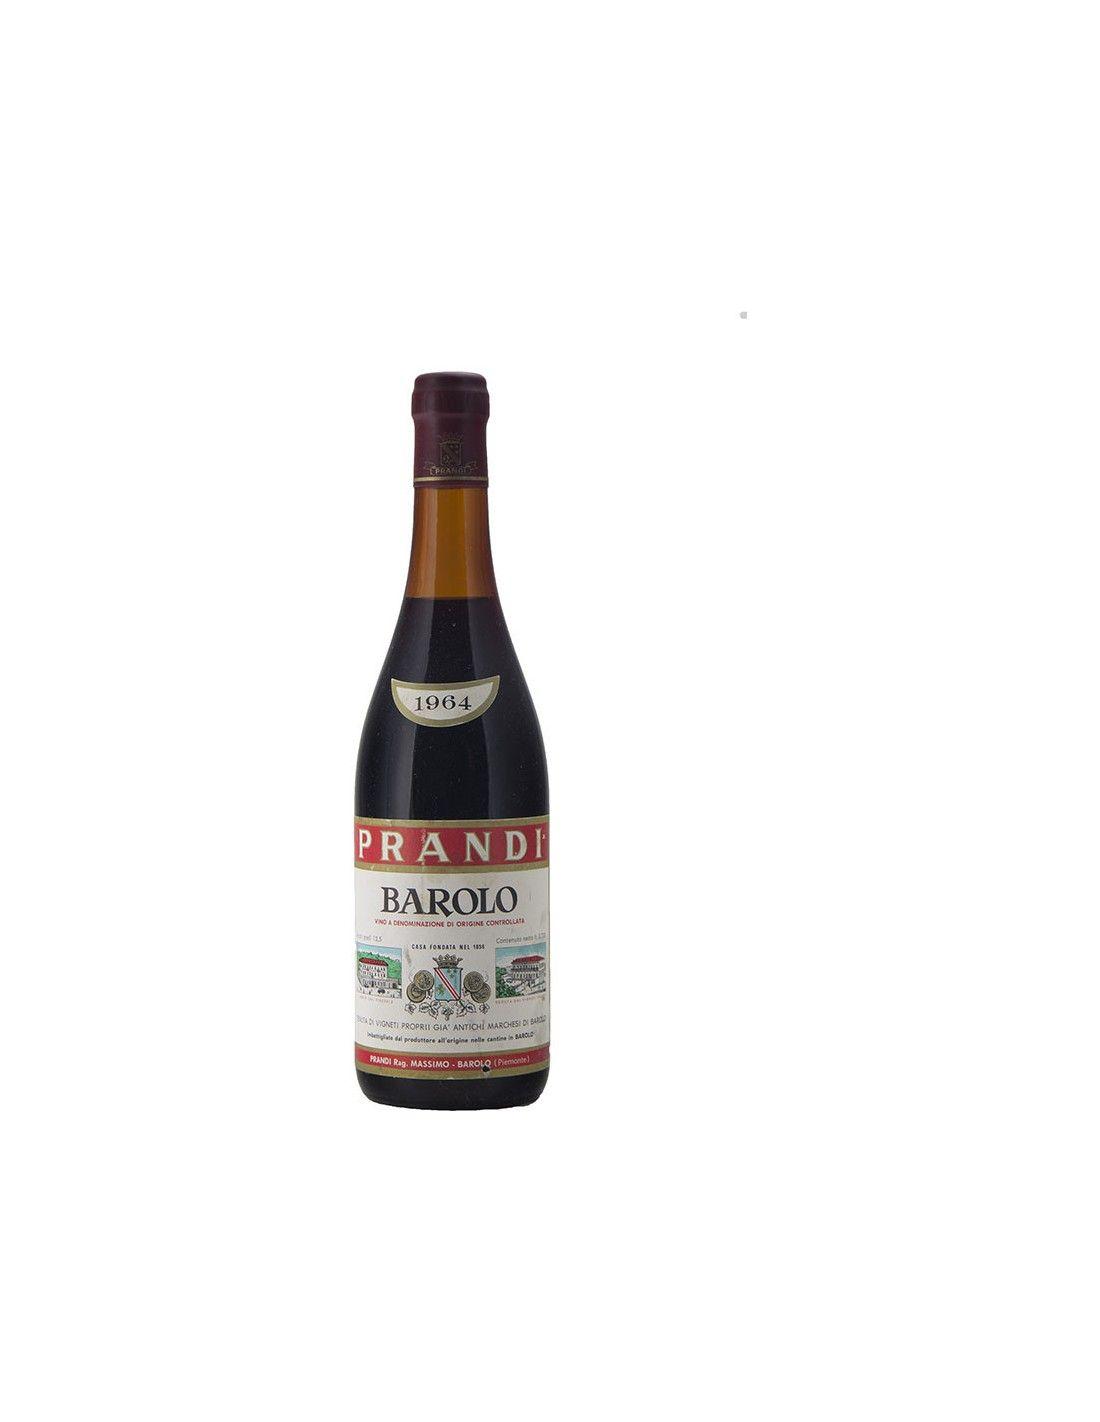 BAROLO 1964 DONATI E PRANDI Grandi Bottiglie